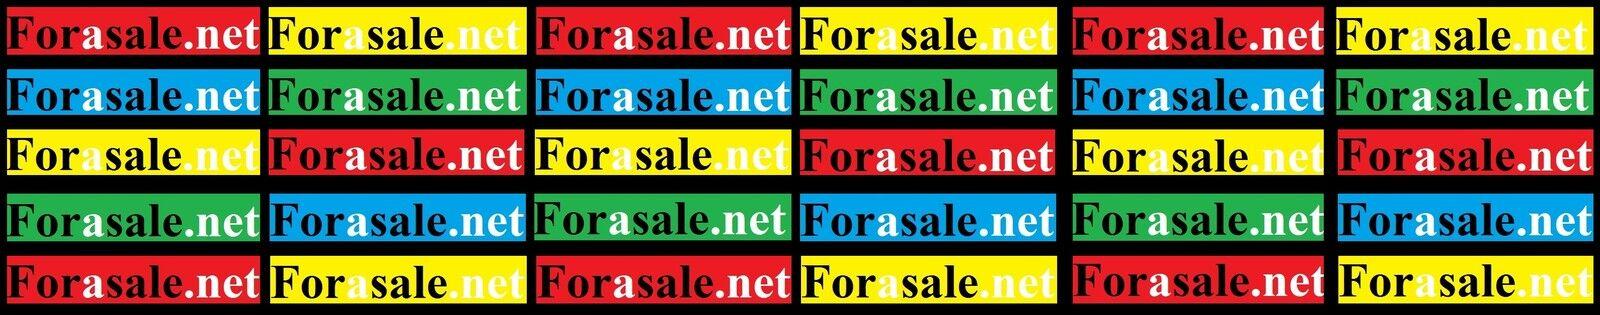 Forasale.net